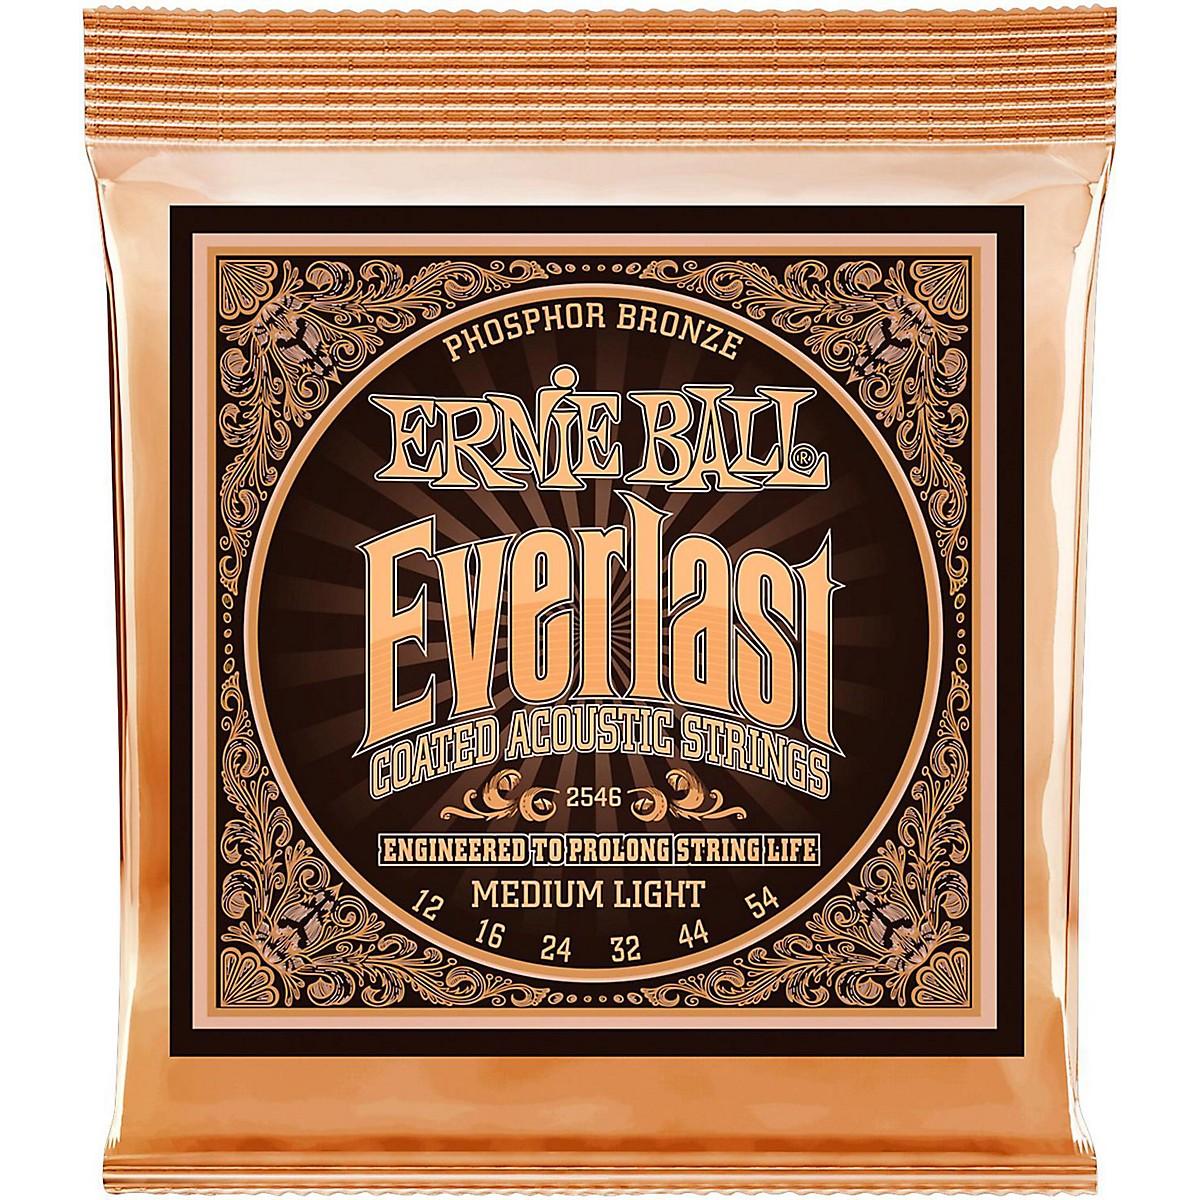 Ernie Ball 2546 Everlast Phosphor Medium Light Acoustic Guitar Strings